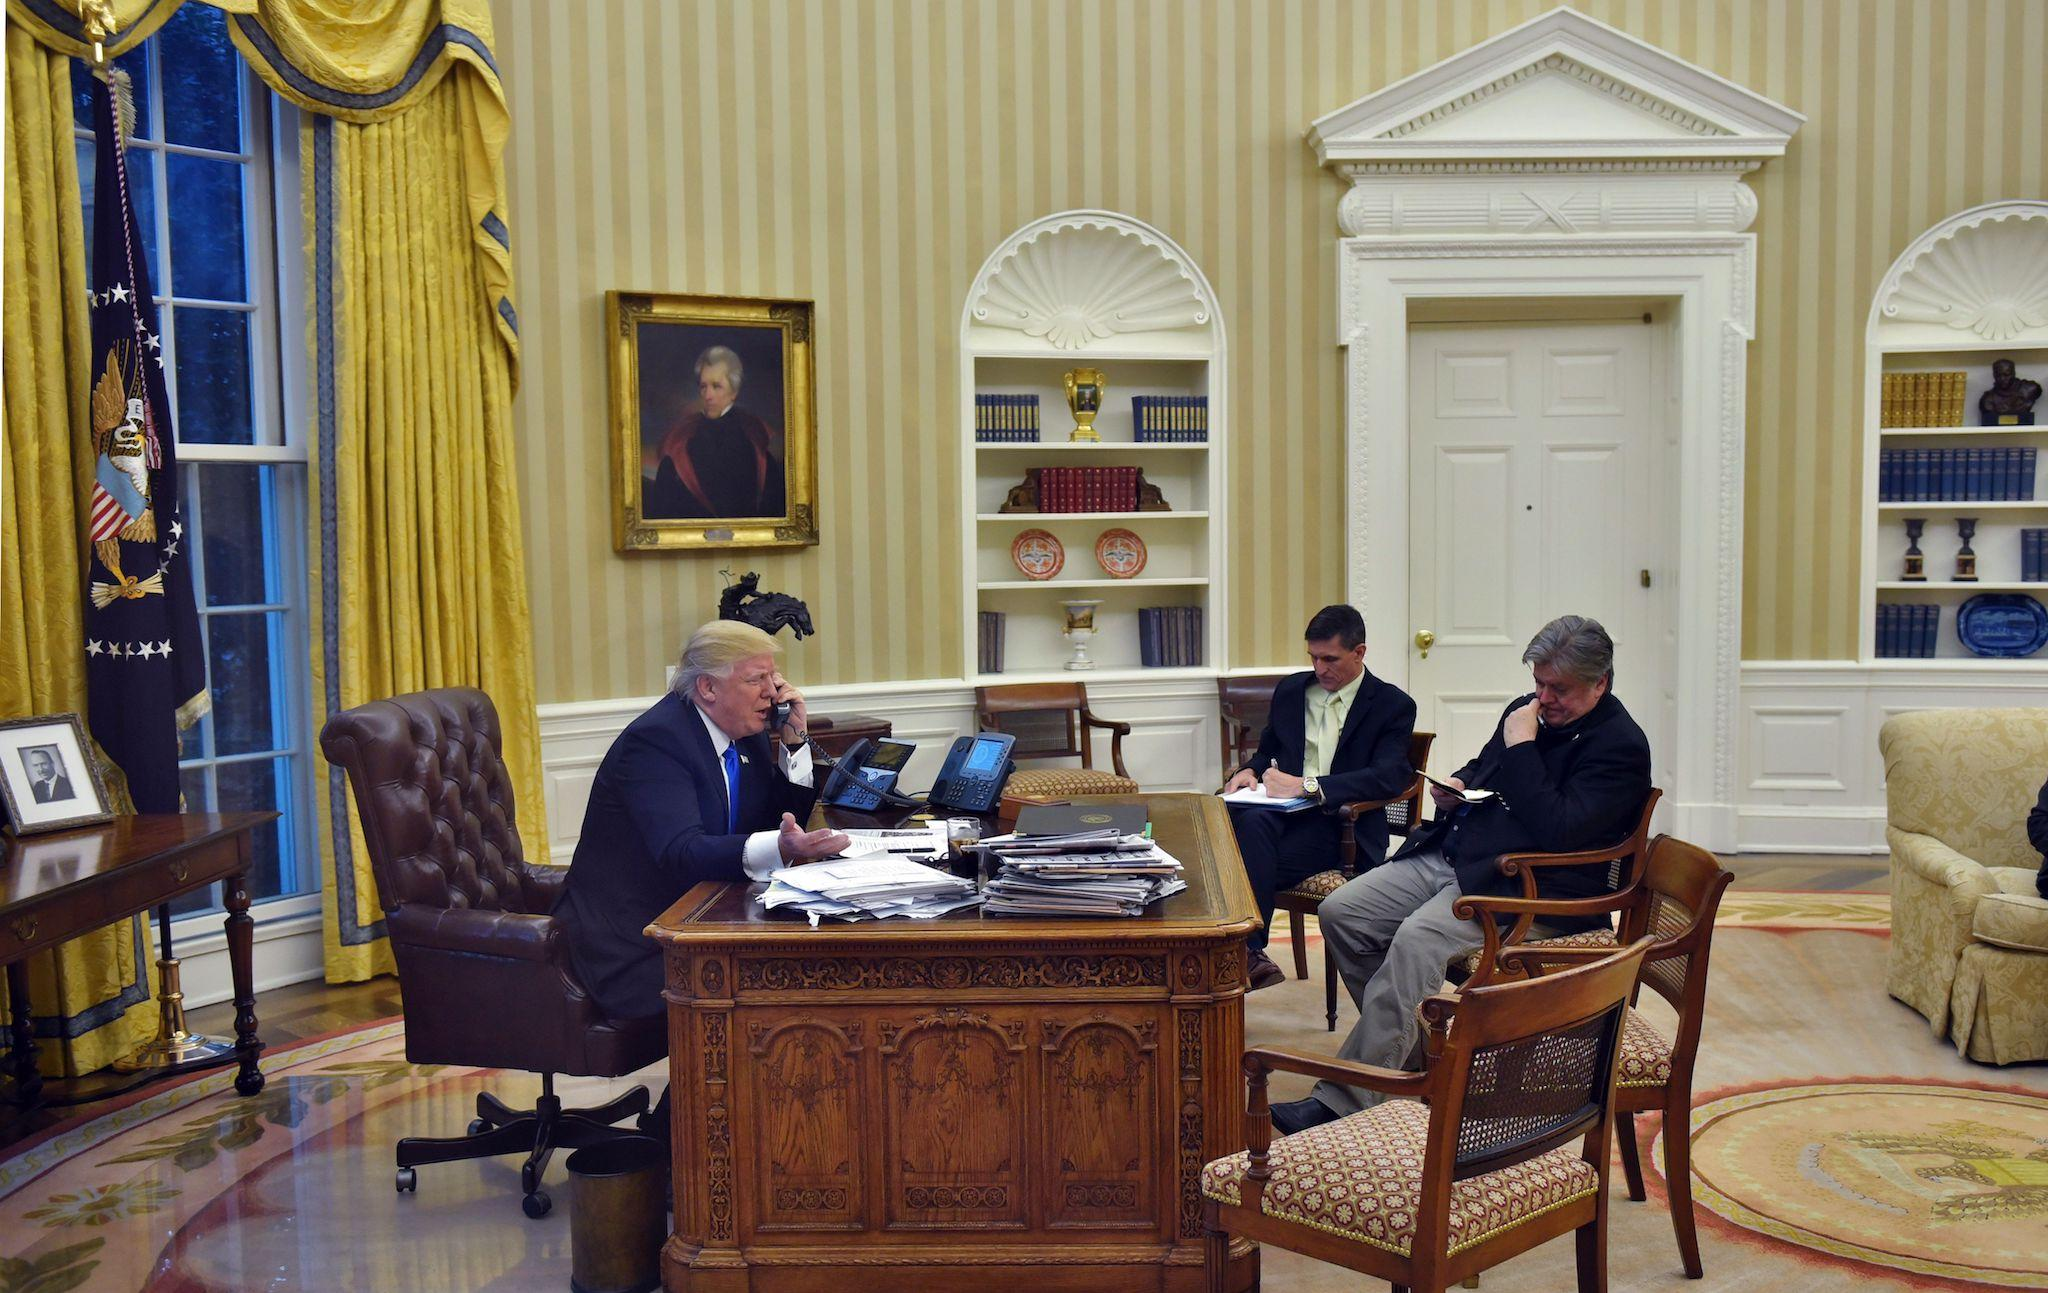 Donald Trump S Closest Advisor Steve Bannon Thinks There